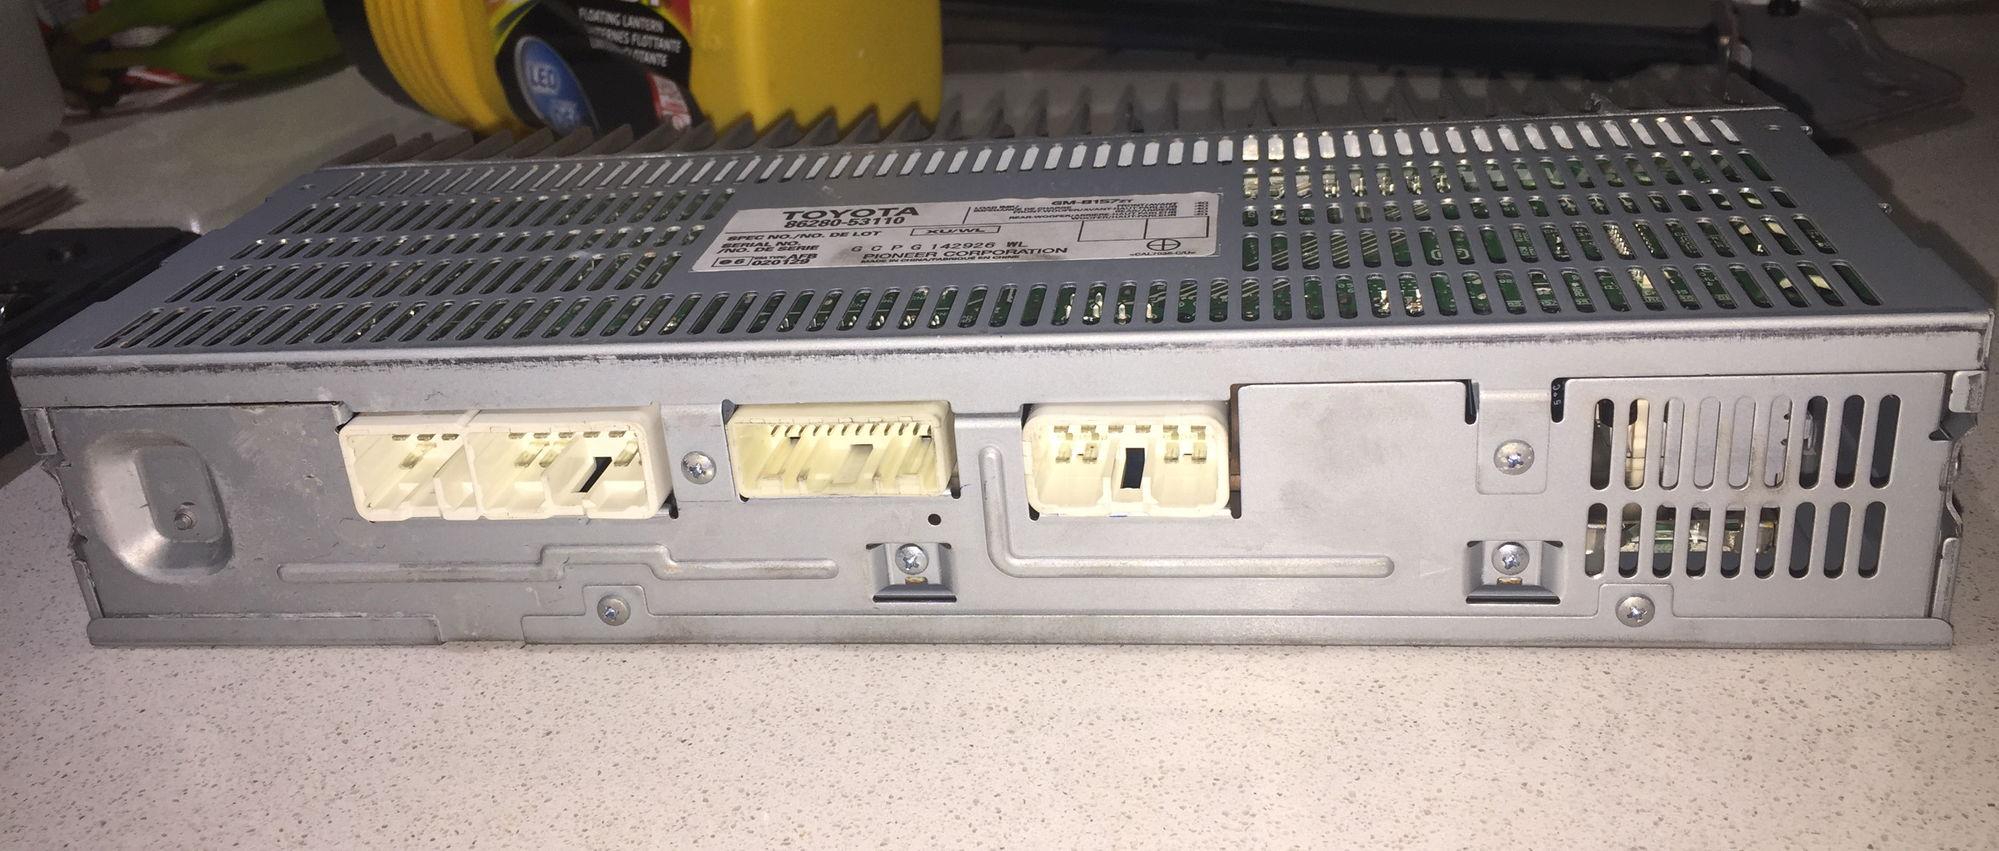 U0026 39 06 Is250 Amplifier Circuit Board Diagram